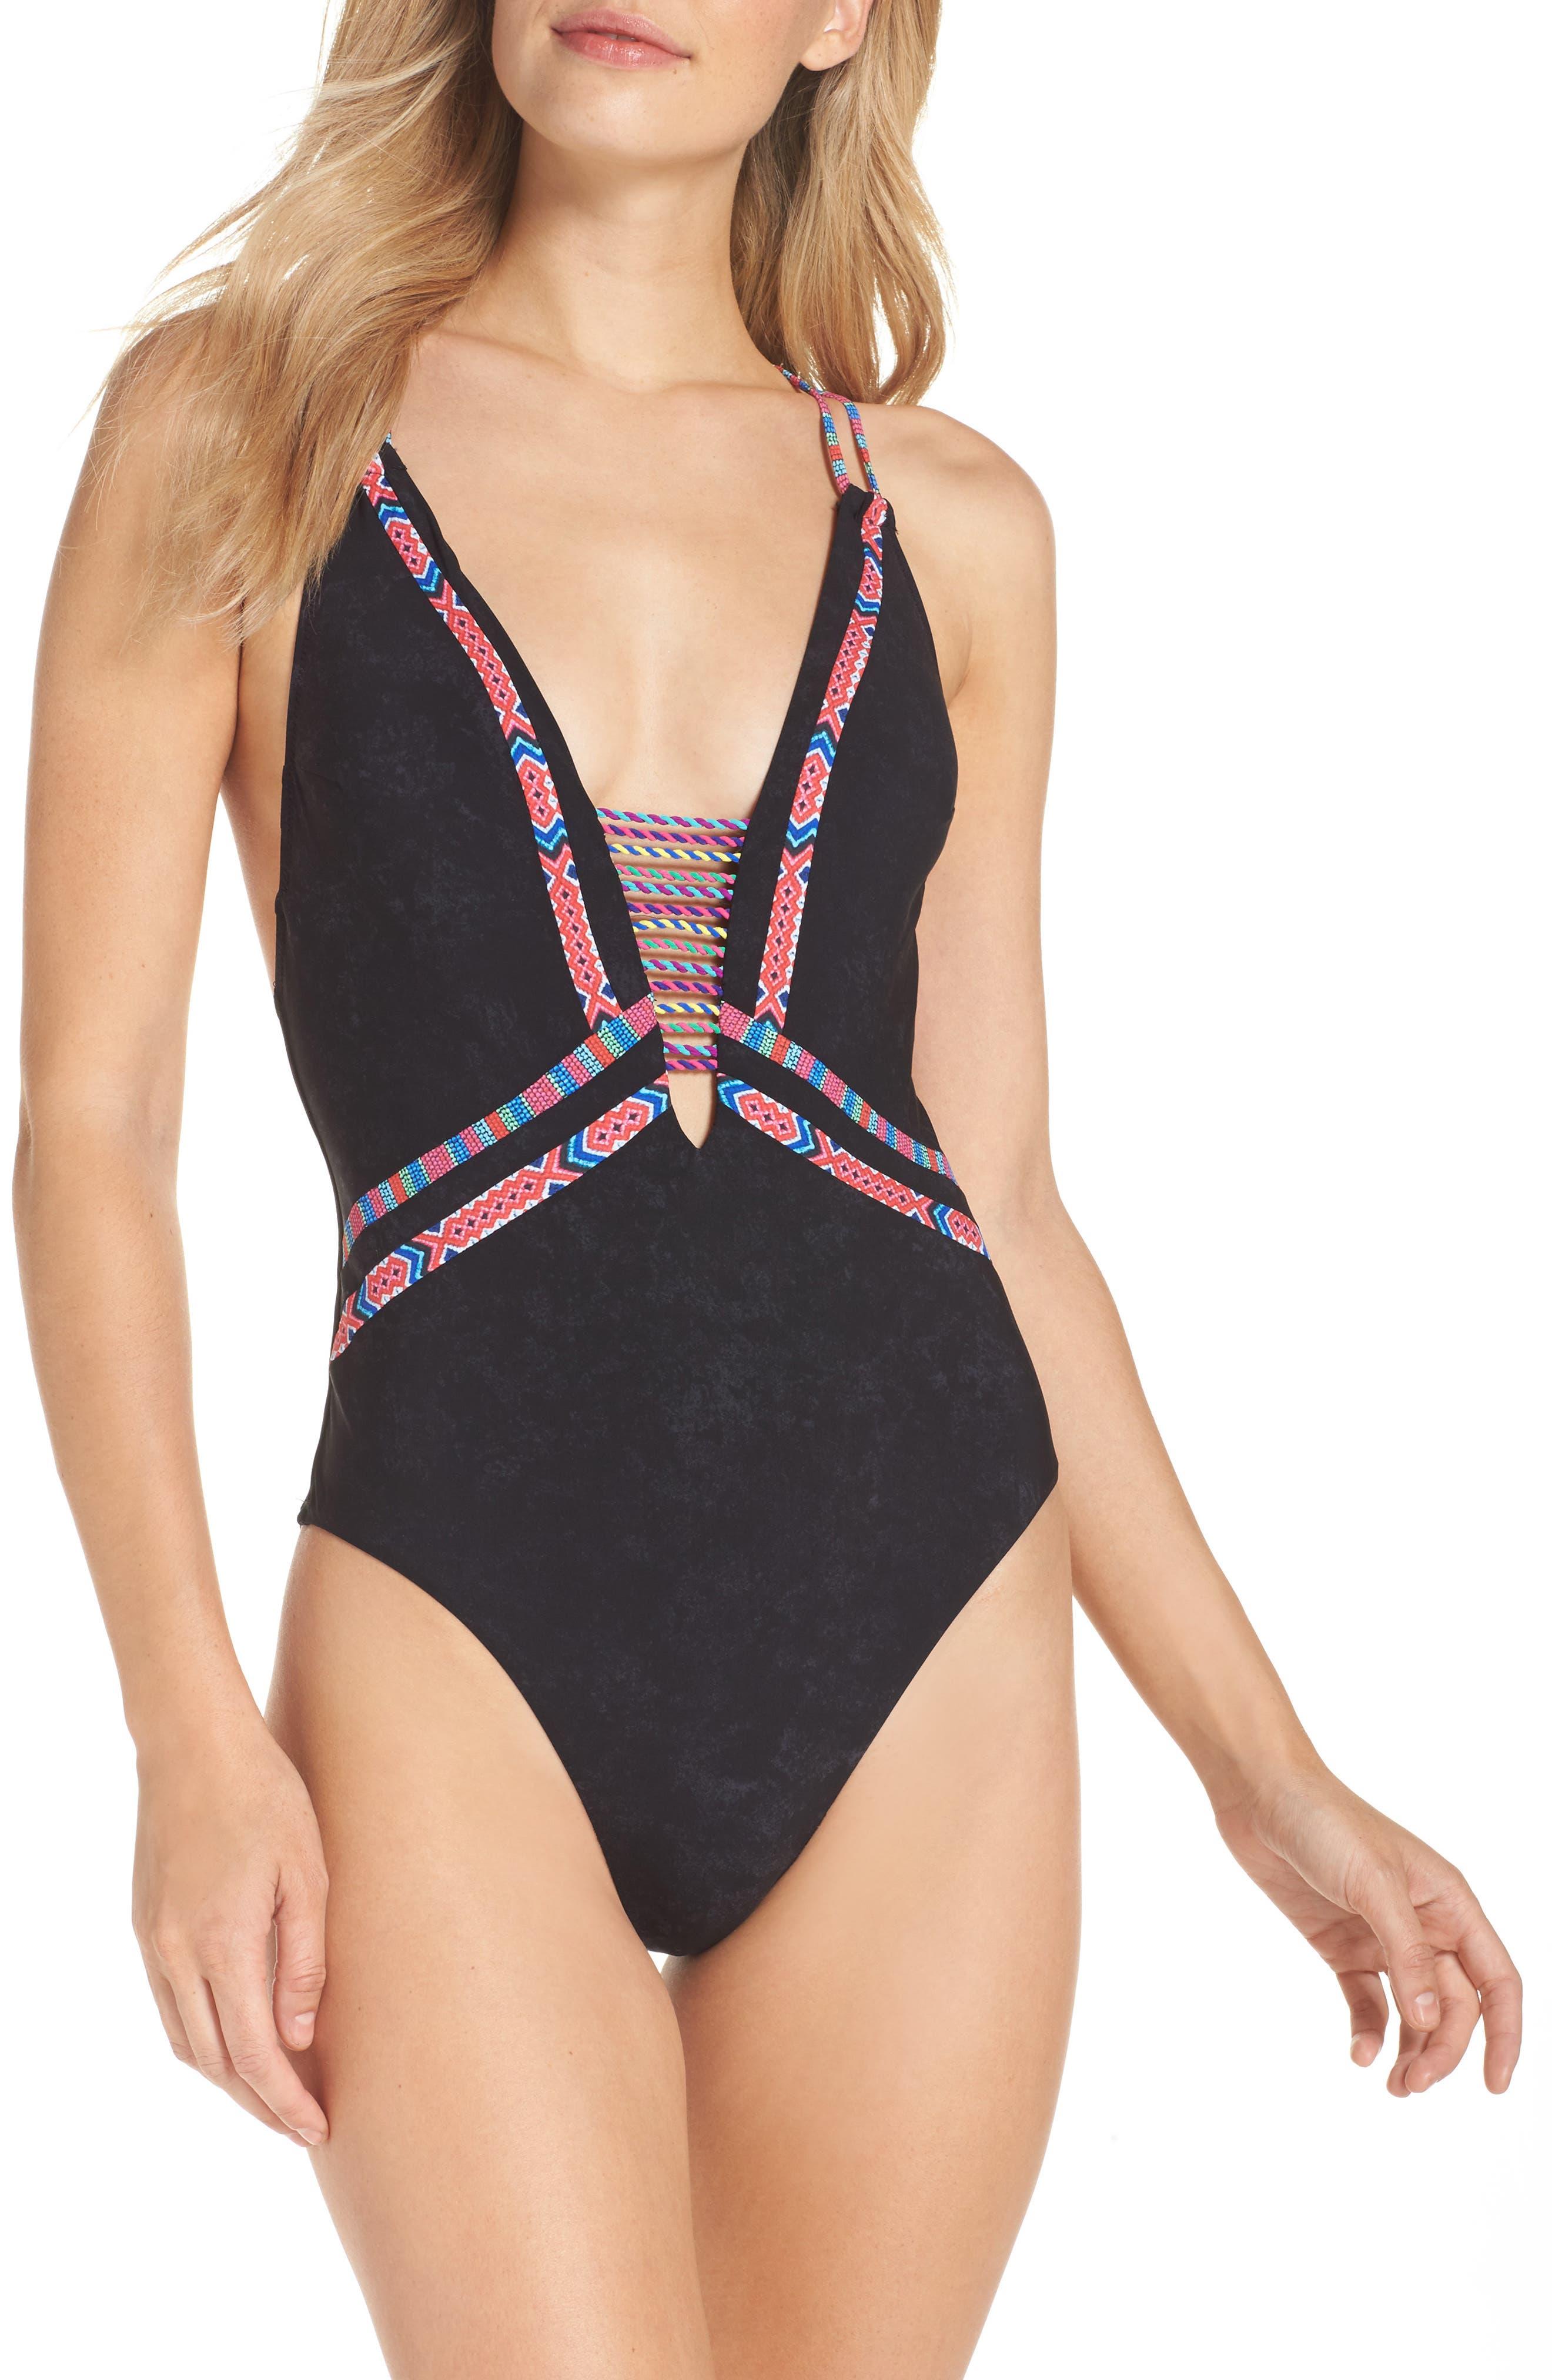 Cha Cha Cha Goddess One-Piece Swimsuit,                         Main,                         color, Black